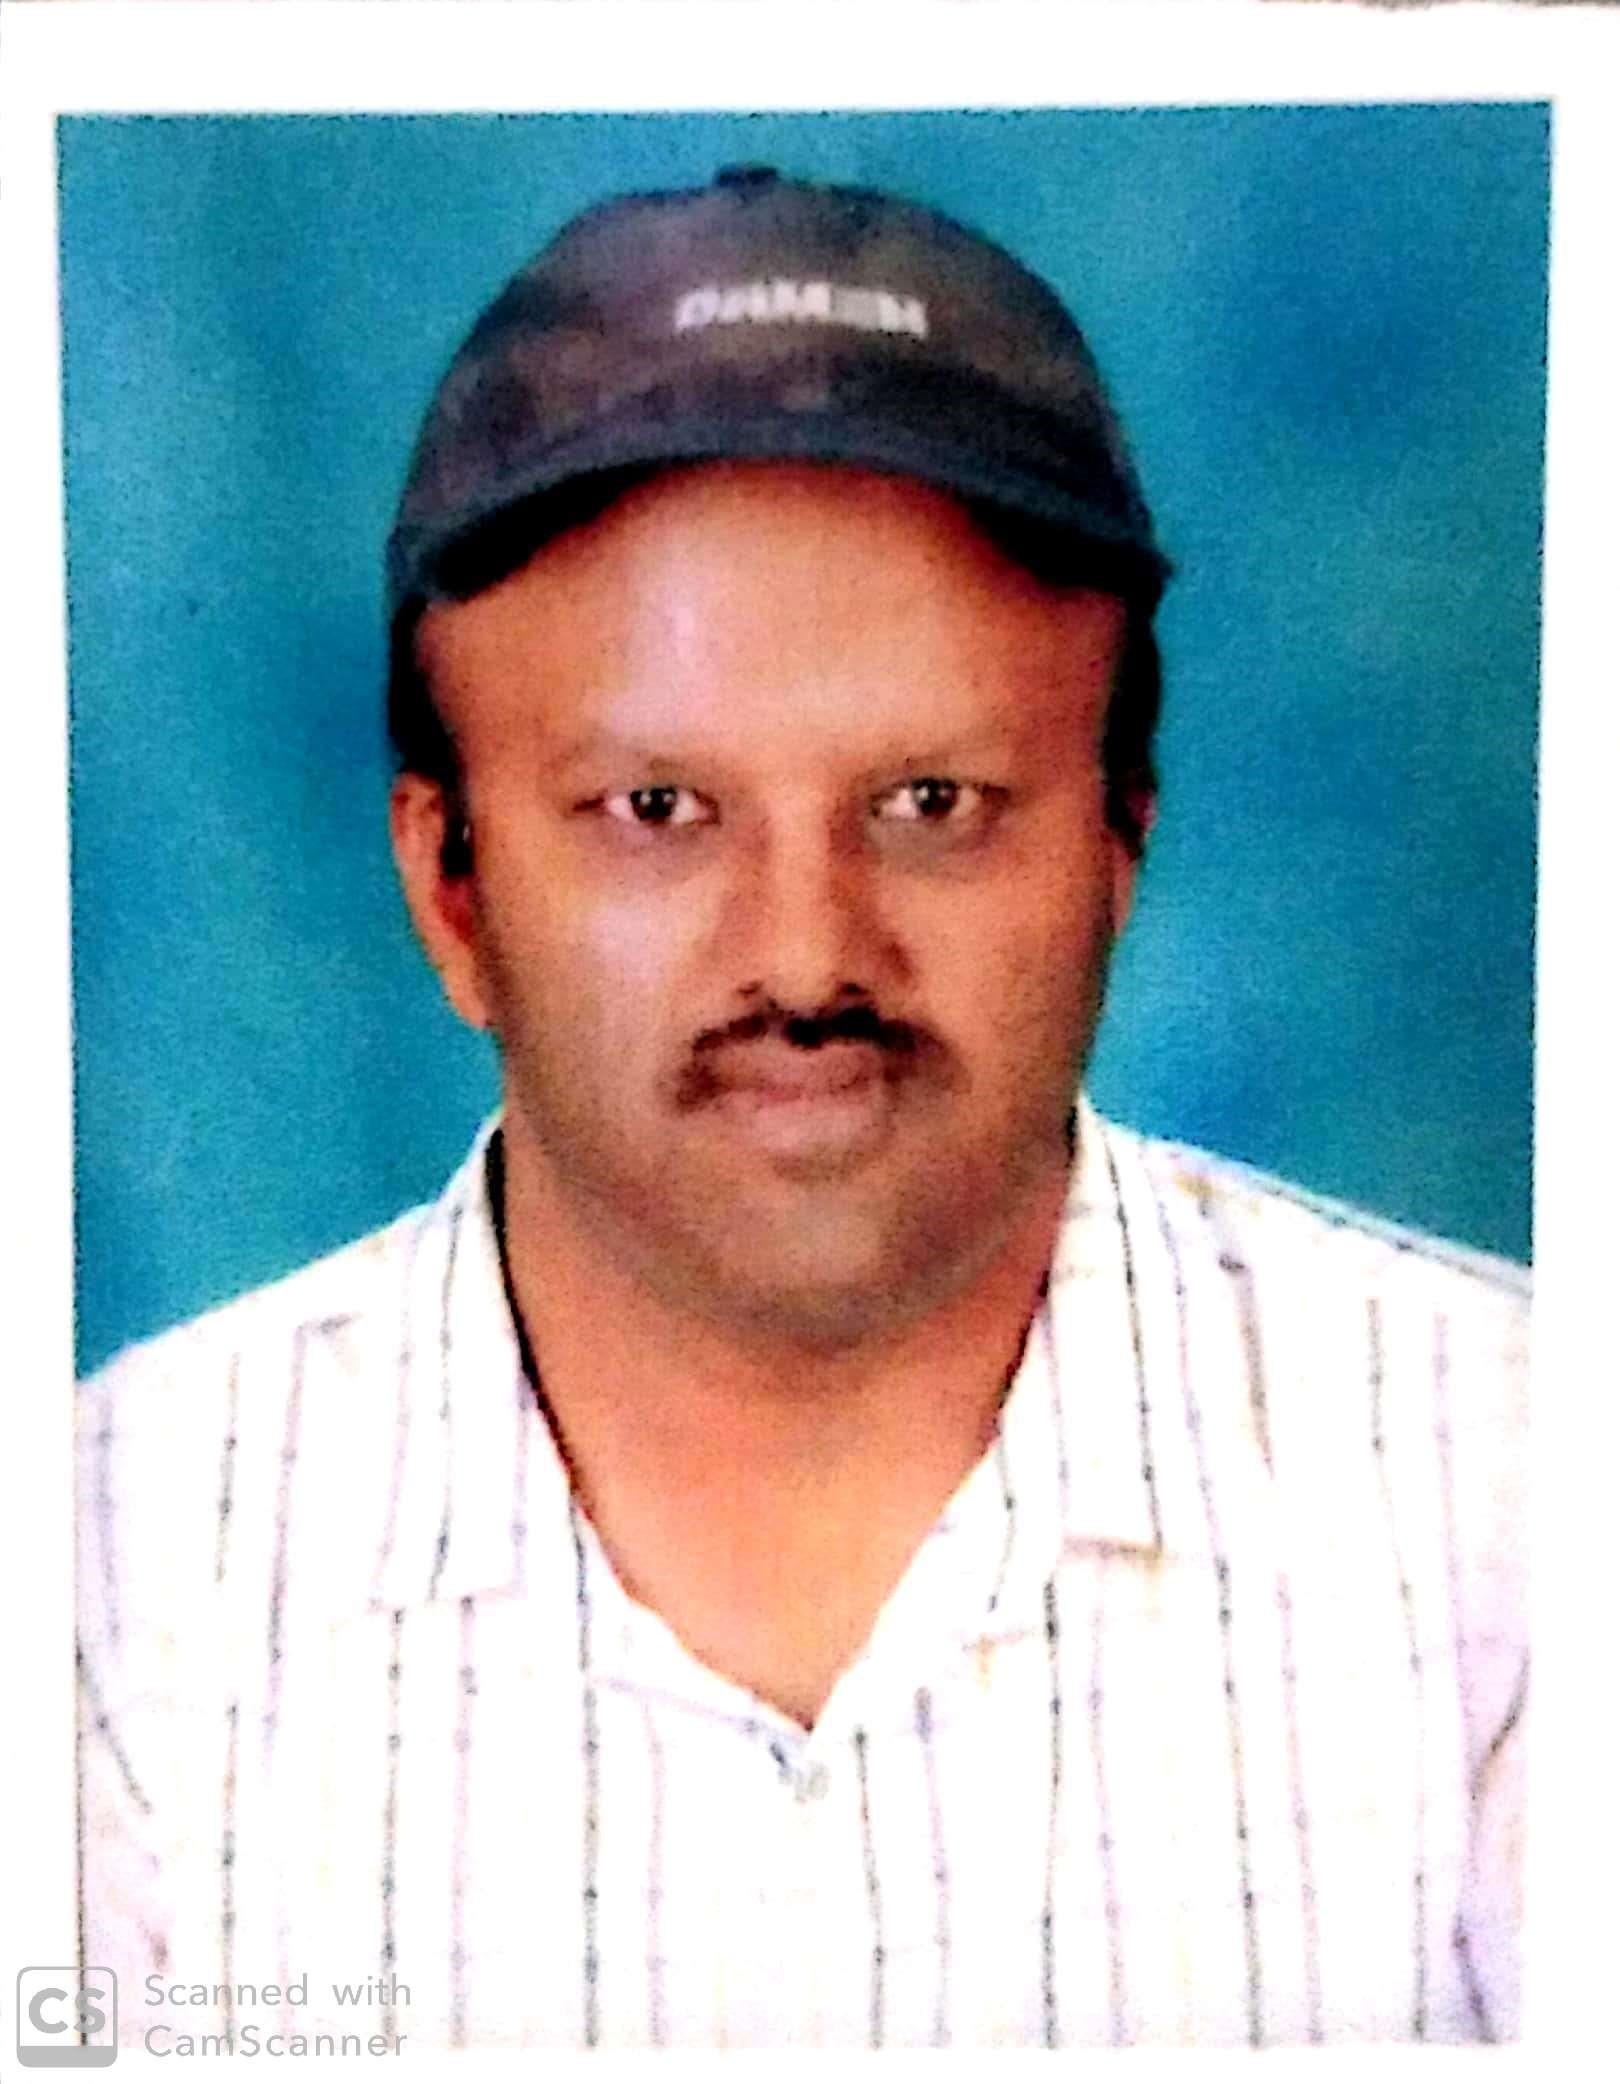 /media/burds/1NGO-00306-Bharath_Urban_And_Rural_Development_Trust-Board_Members-Trustee.jpg